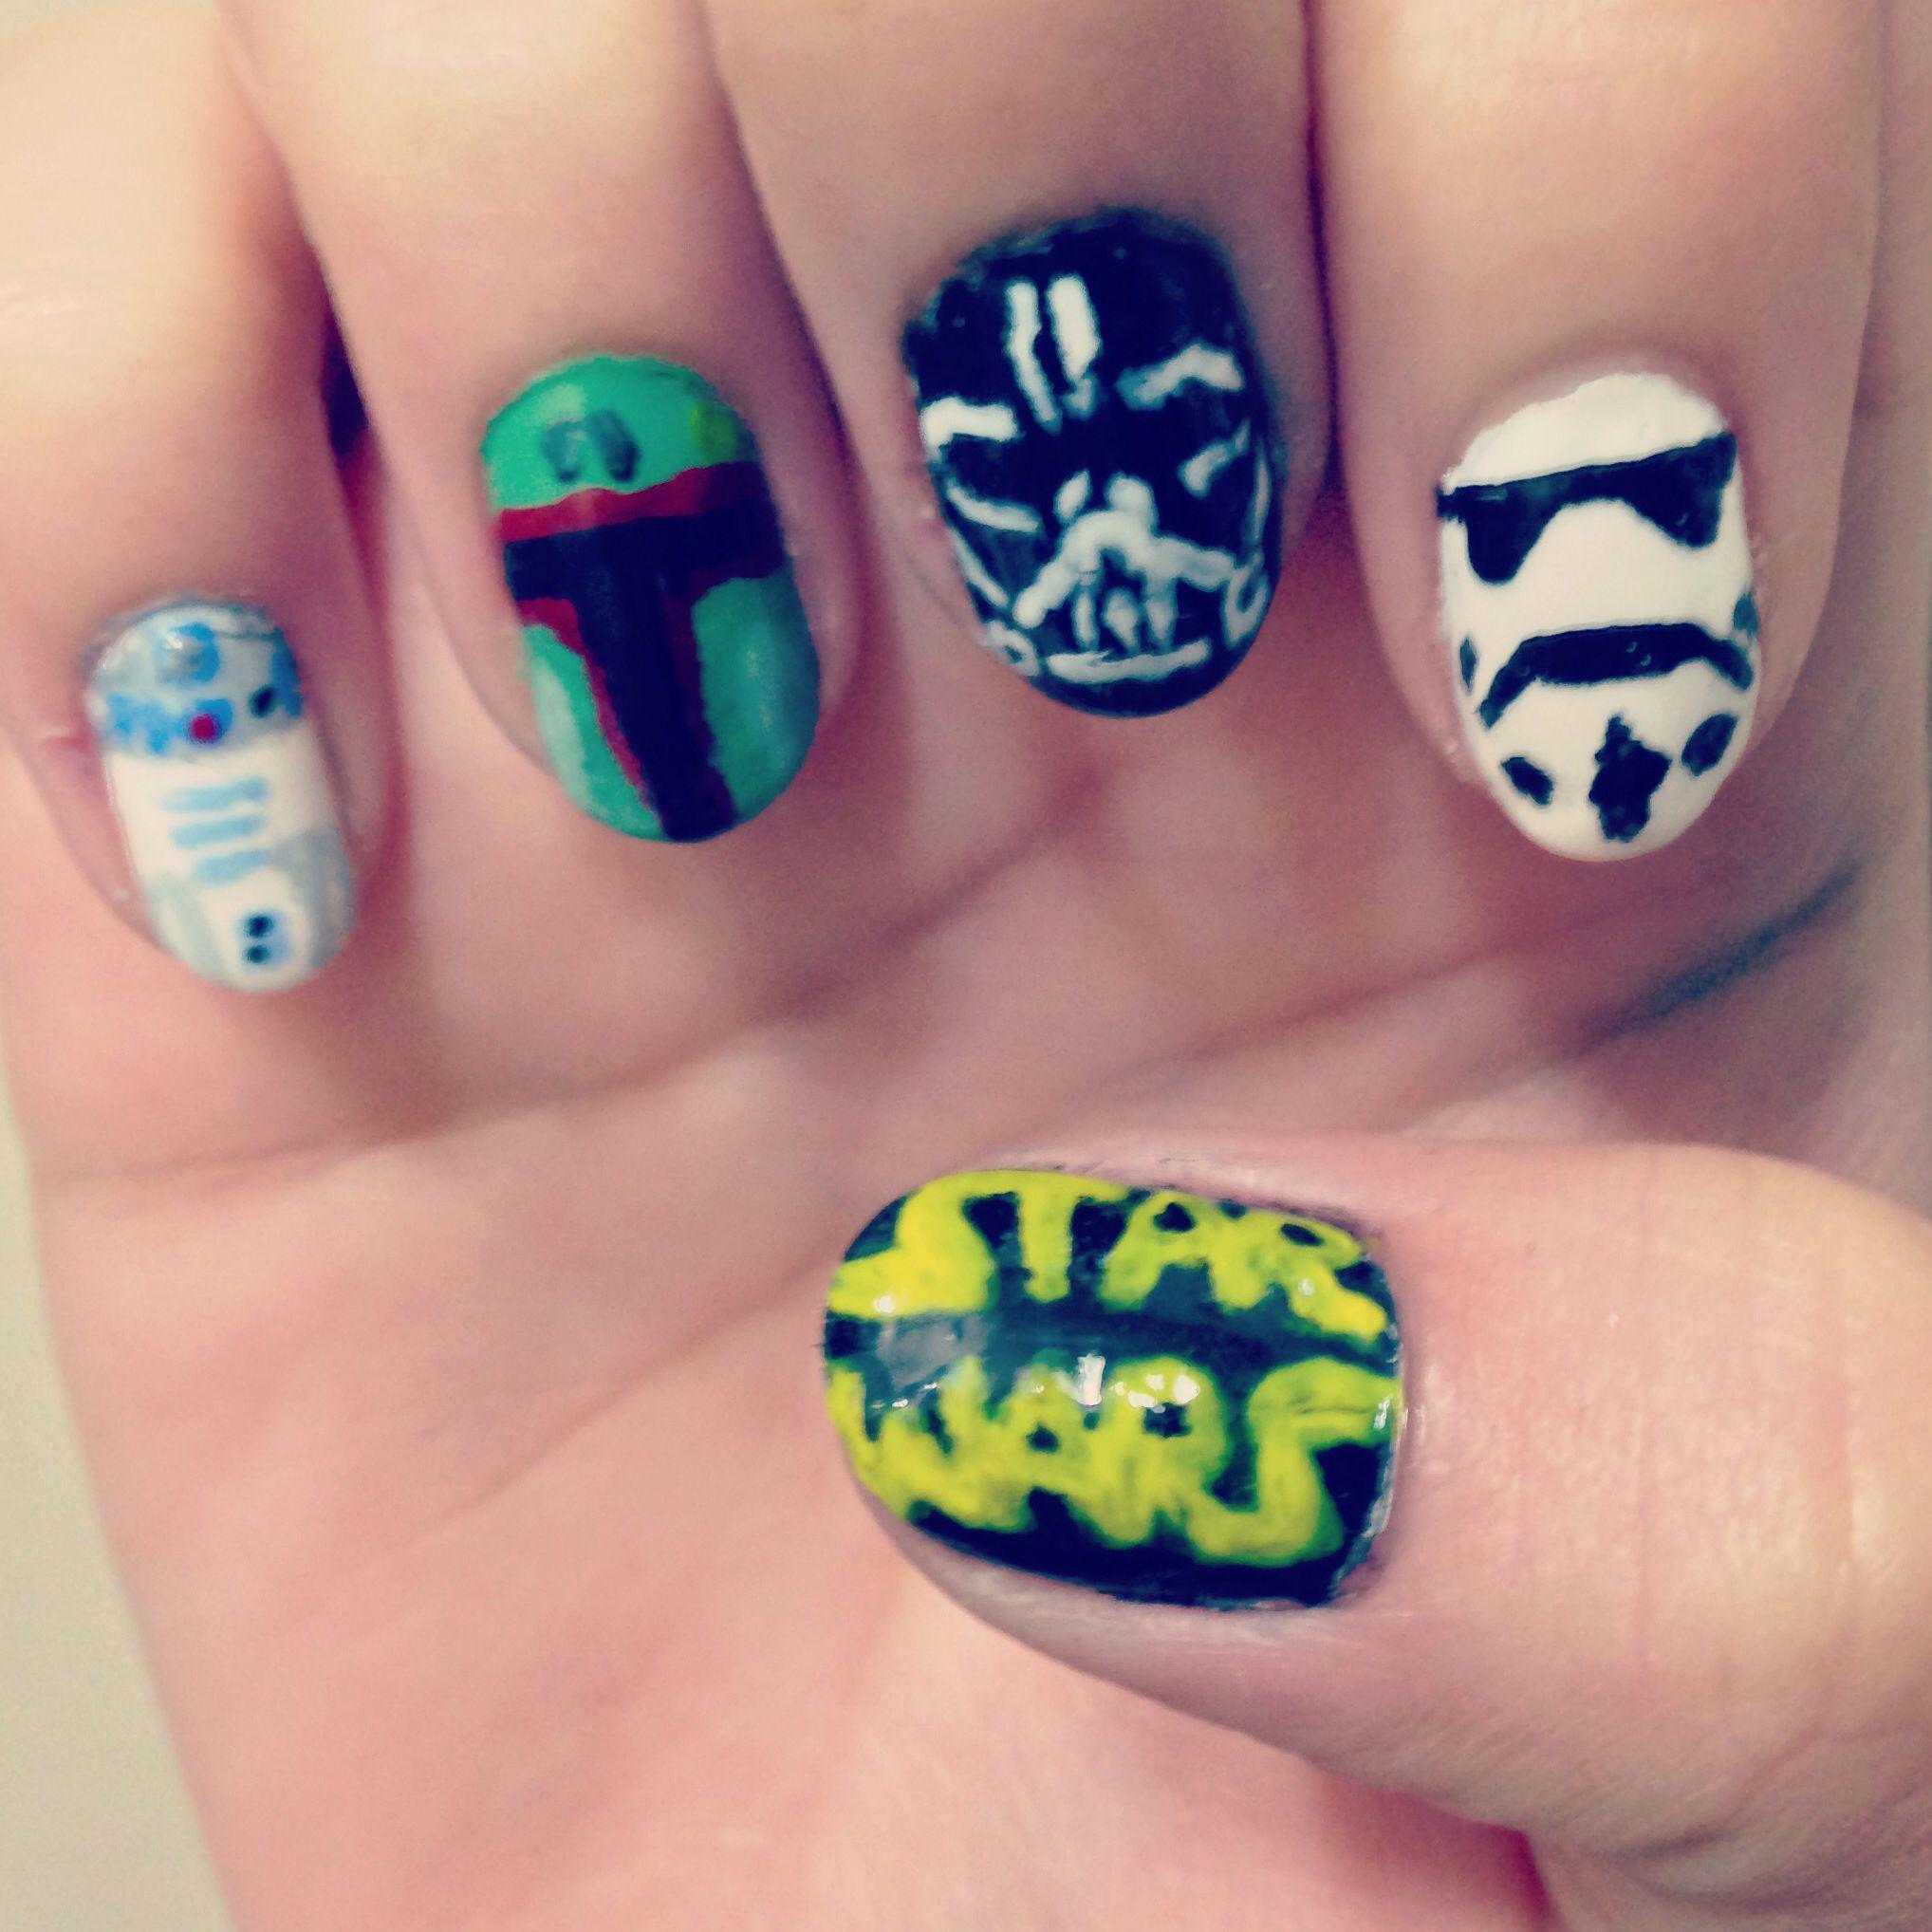 Star Wars nail art May Day 4 | Stuff I\'ve Done | Pinterest | Star ...